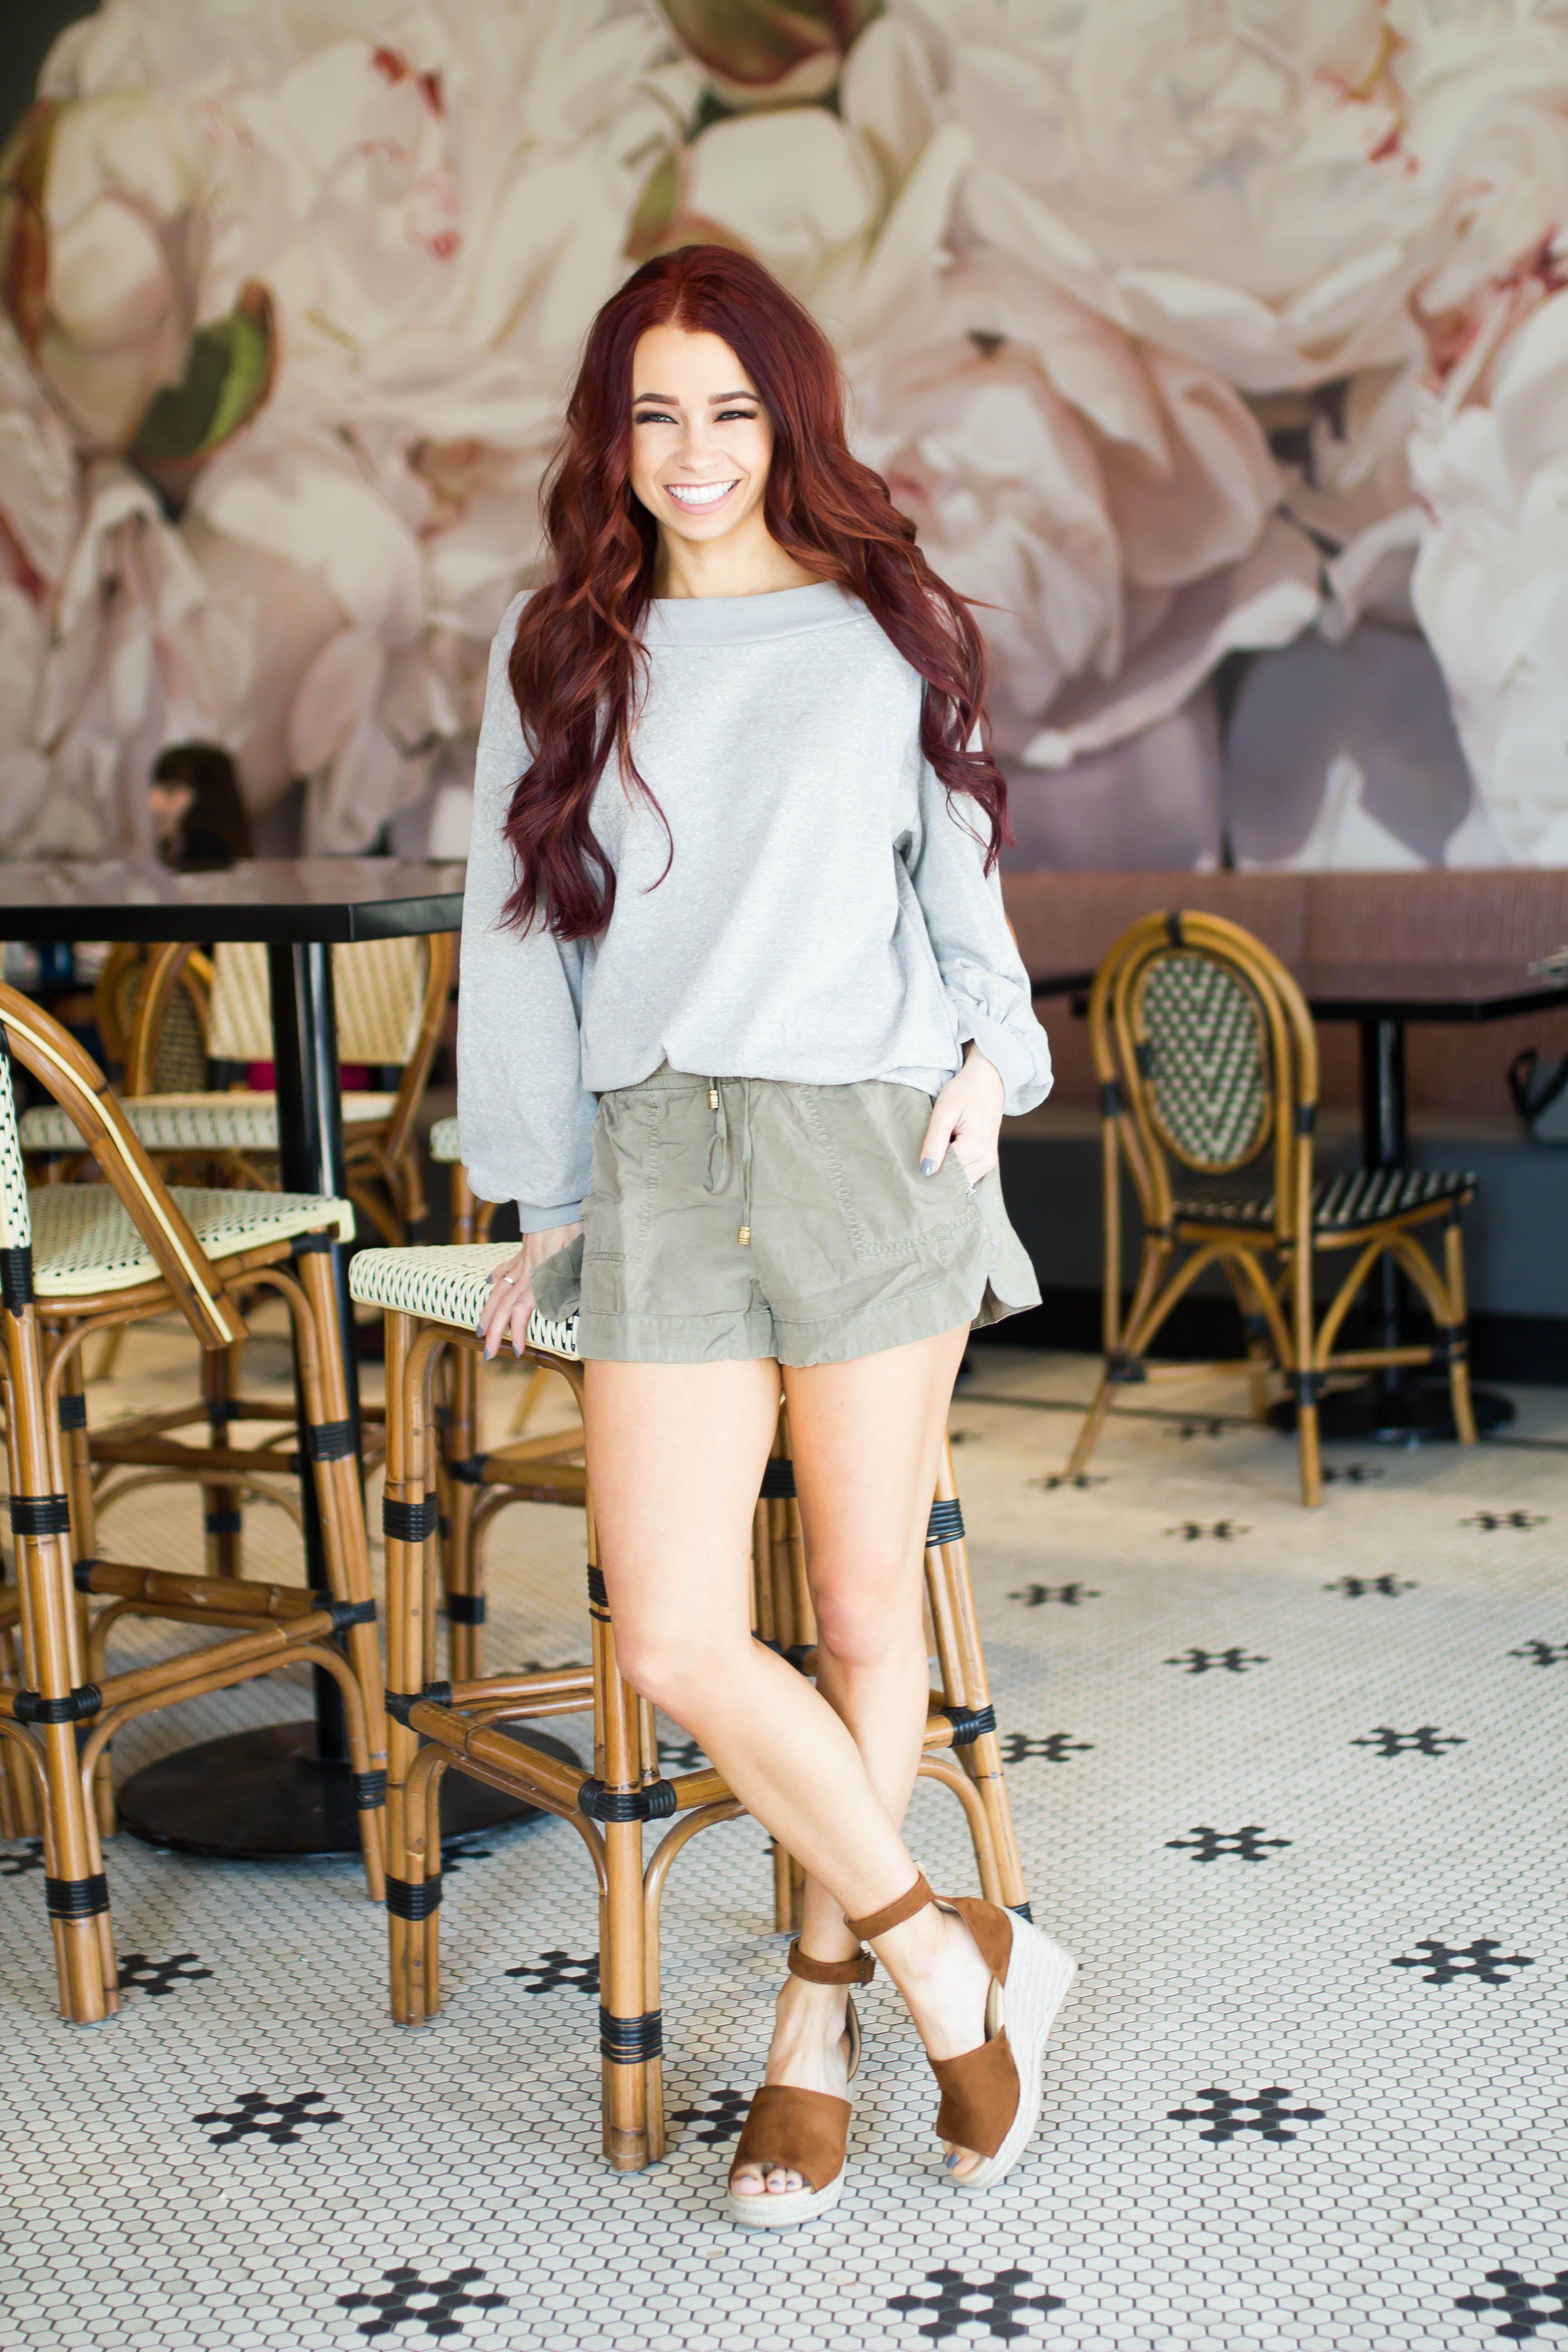 62459dc817b50 Spring style || spring fashion inspiration || spring fashion 2019 || spring  trends || spring outfit idea || spring style inspiration || red hair || red  hair ...